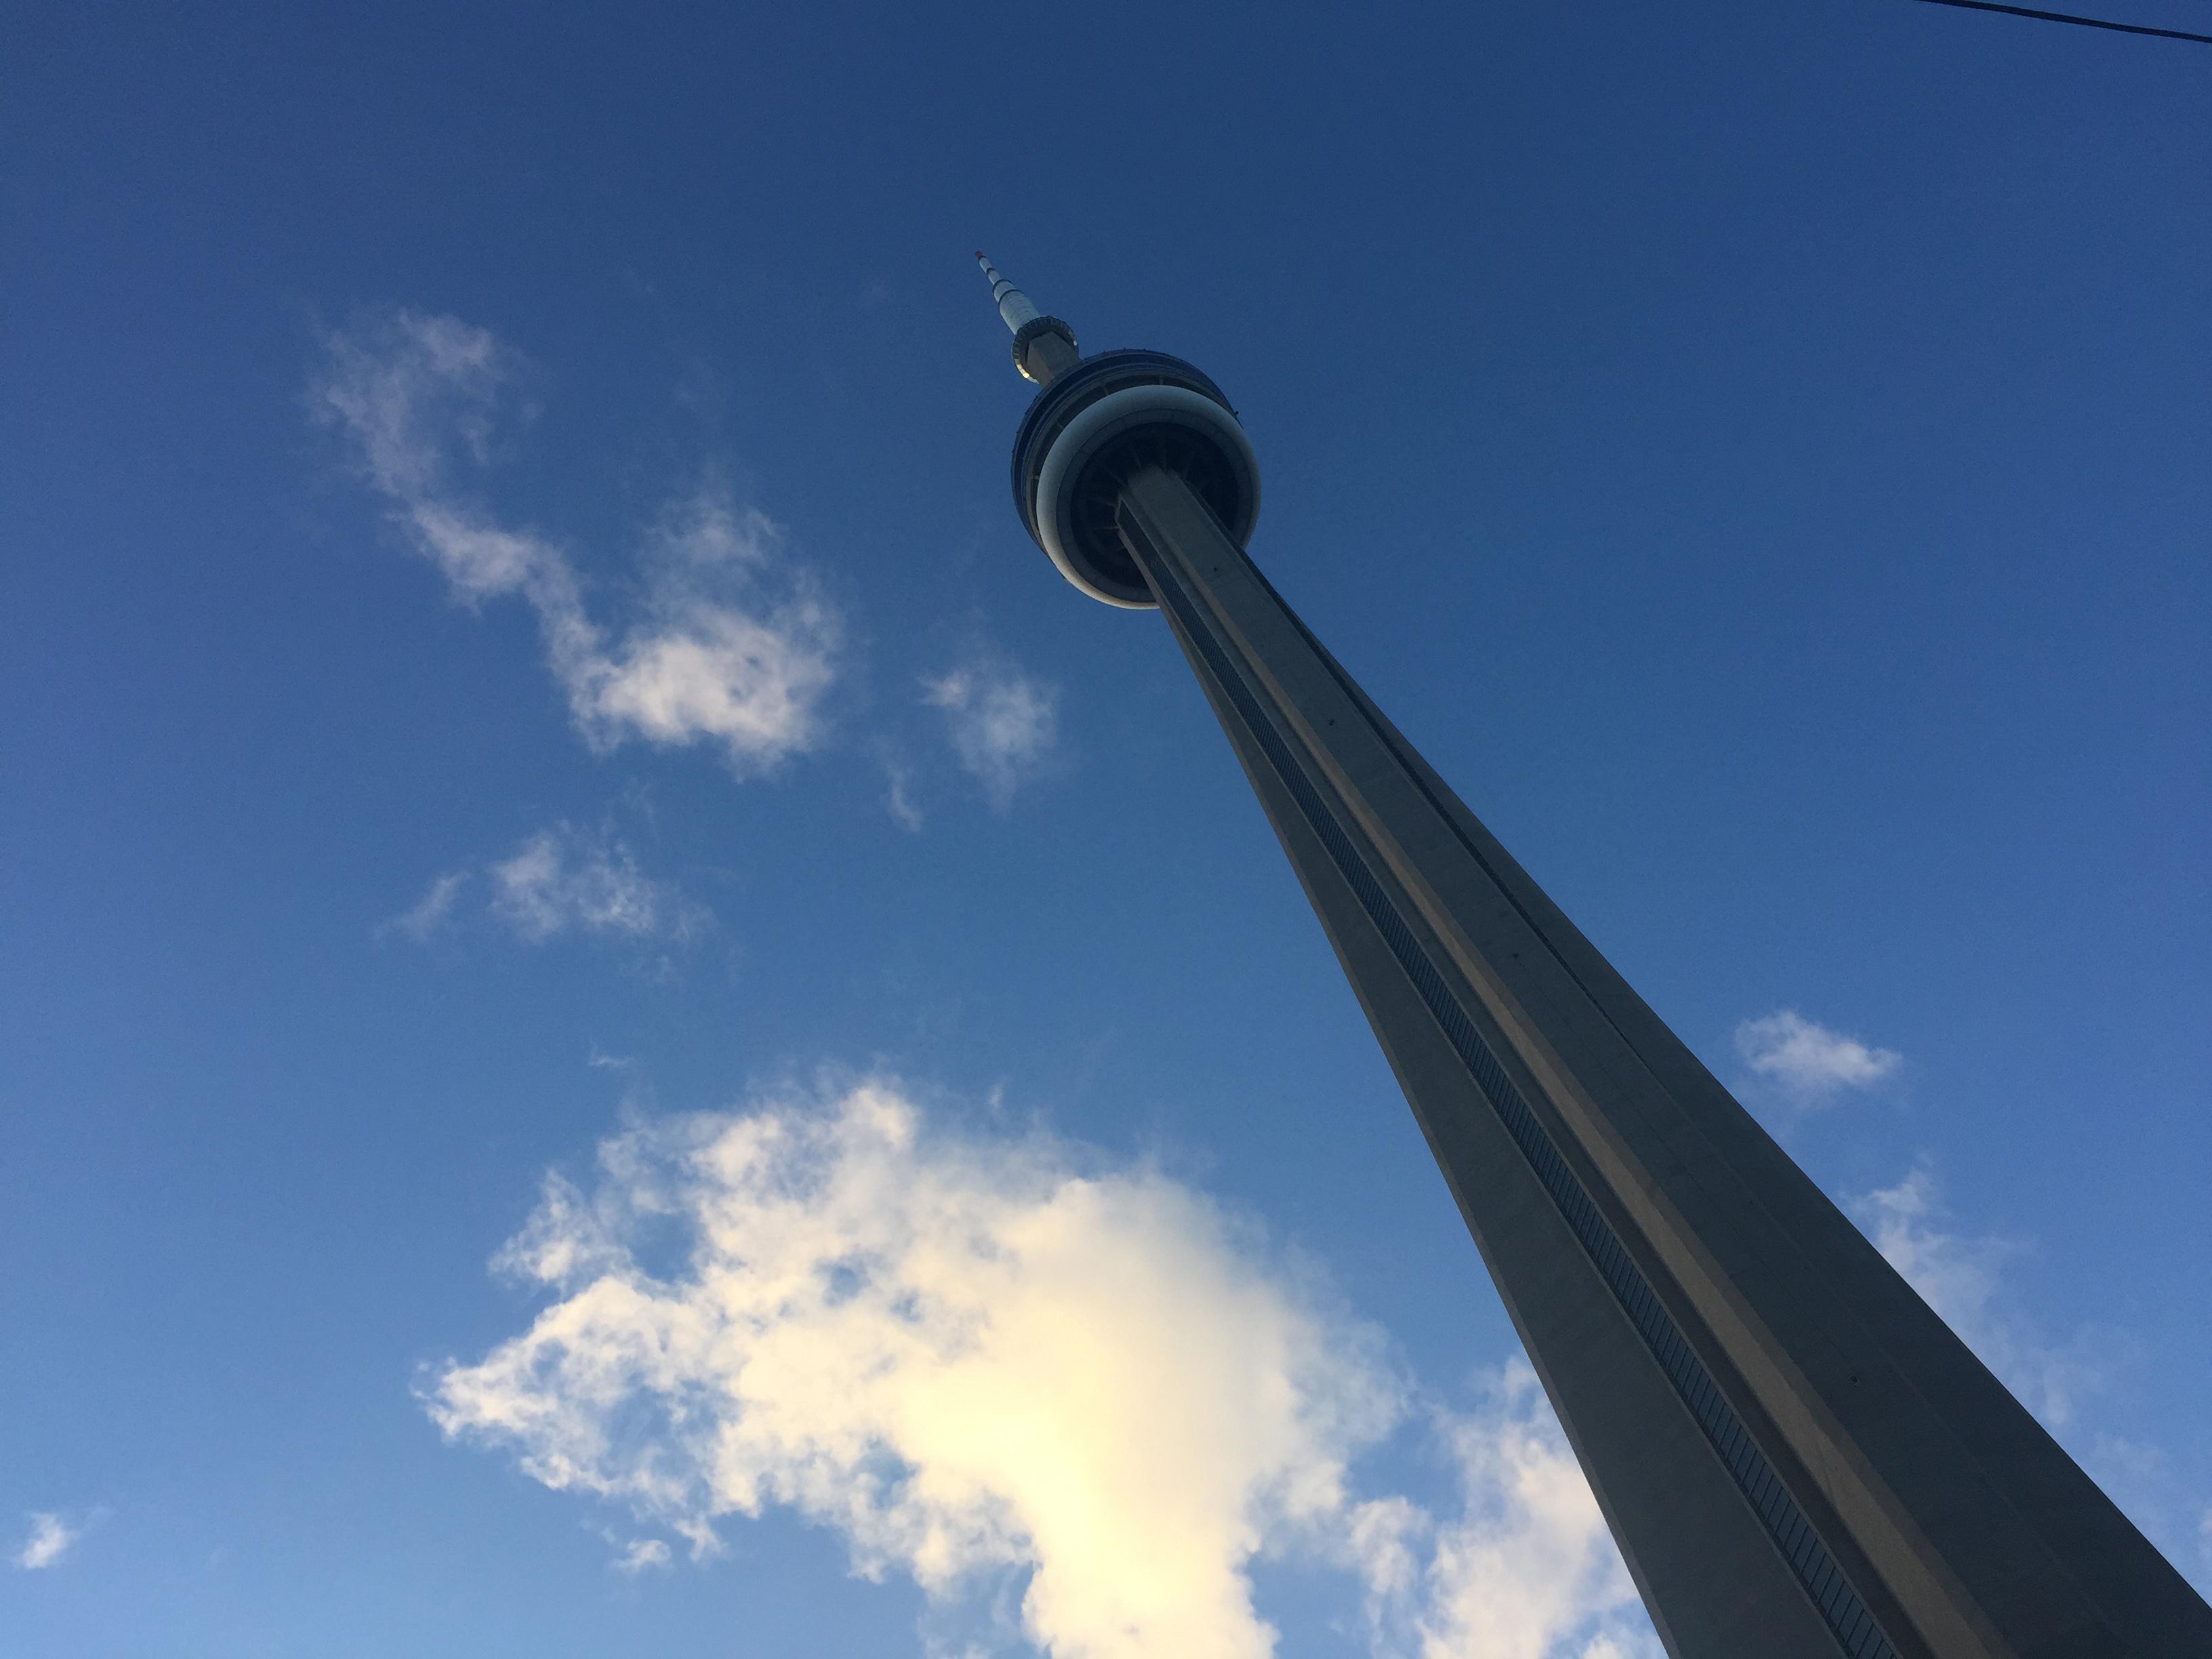 File photo of the CN Tower in Toronto. CITYNEWS/Diana Pereira